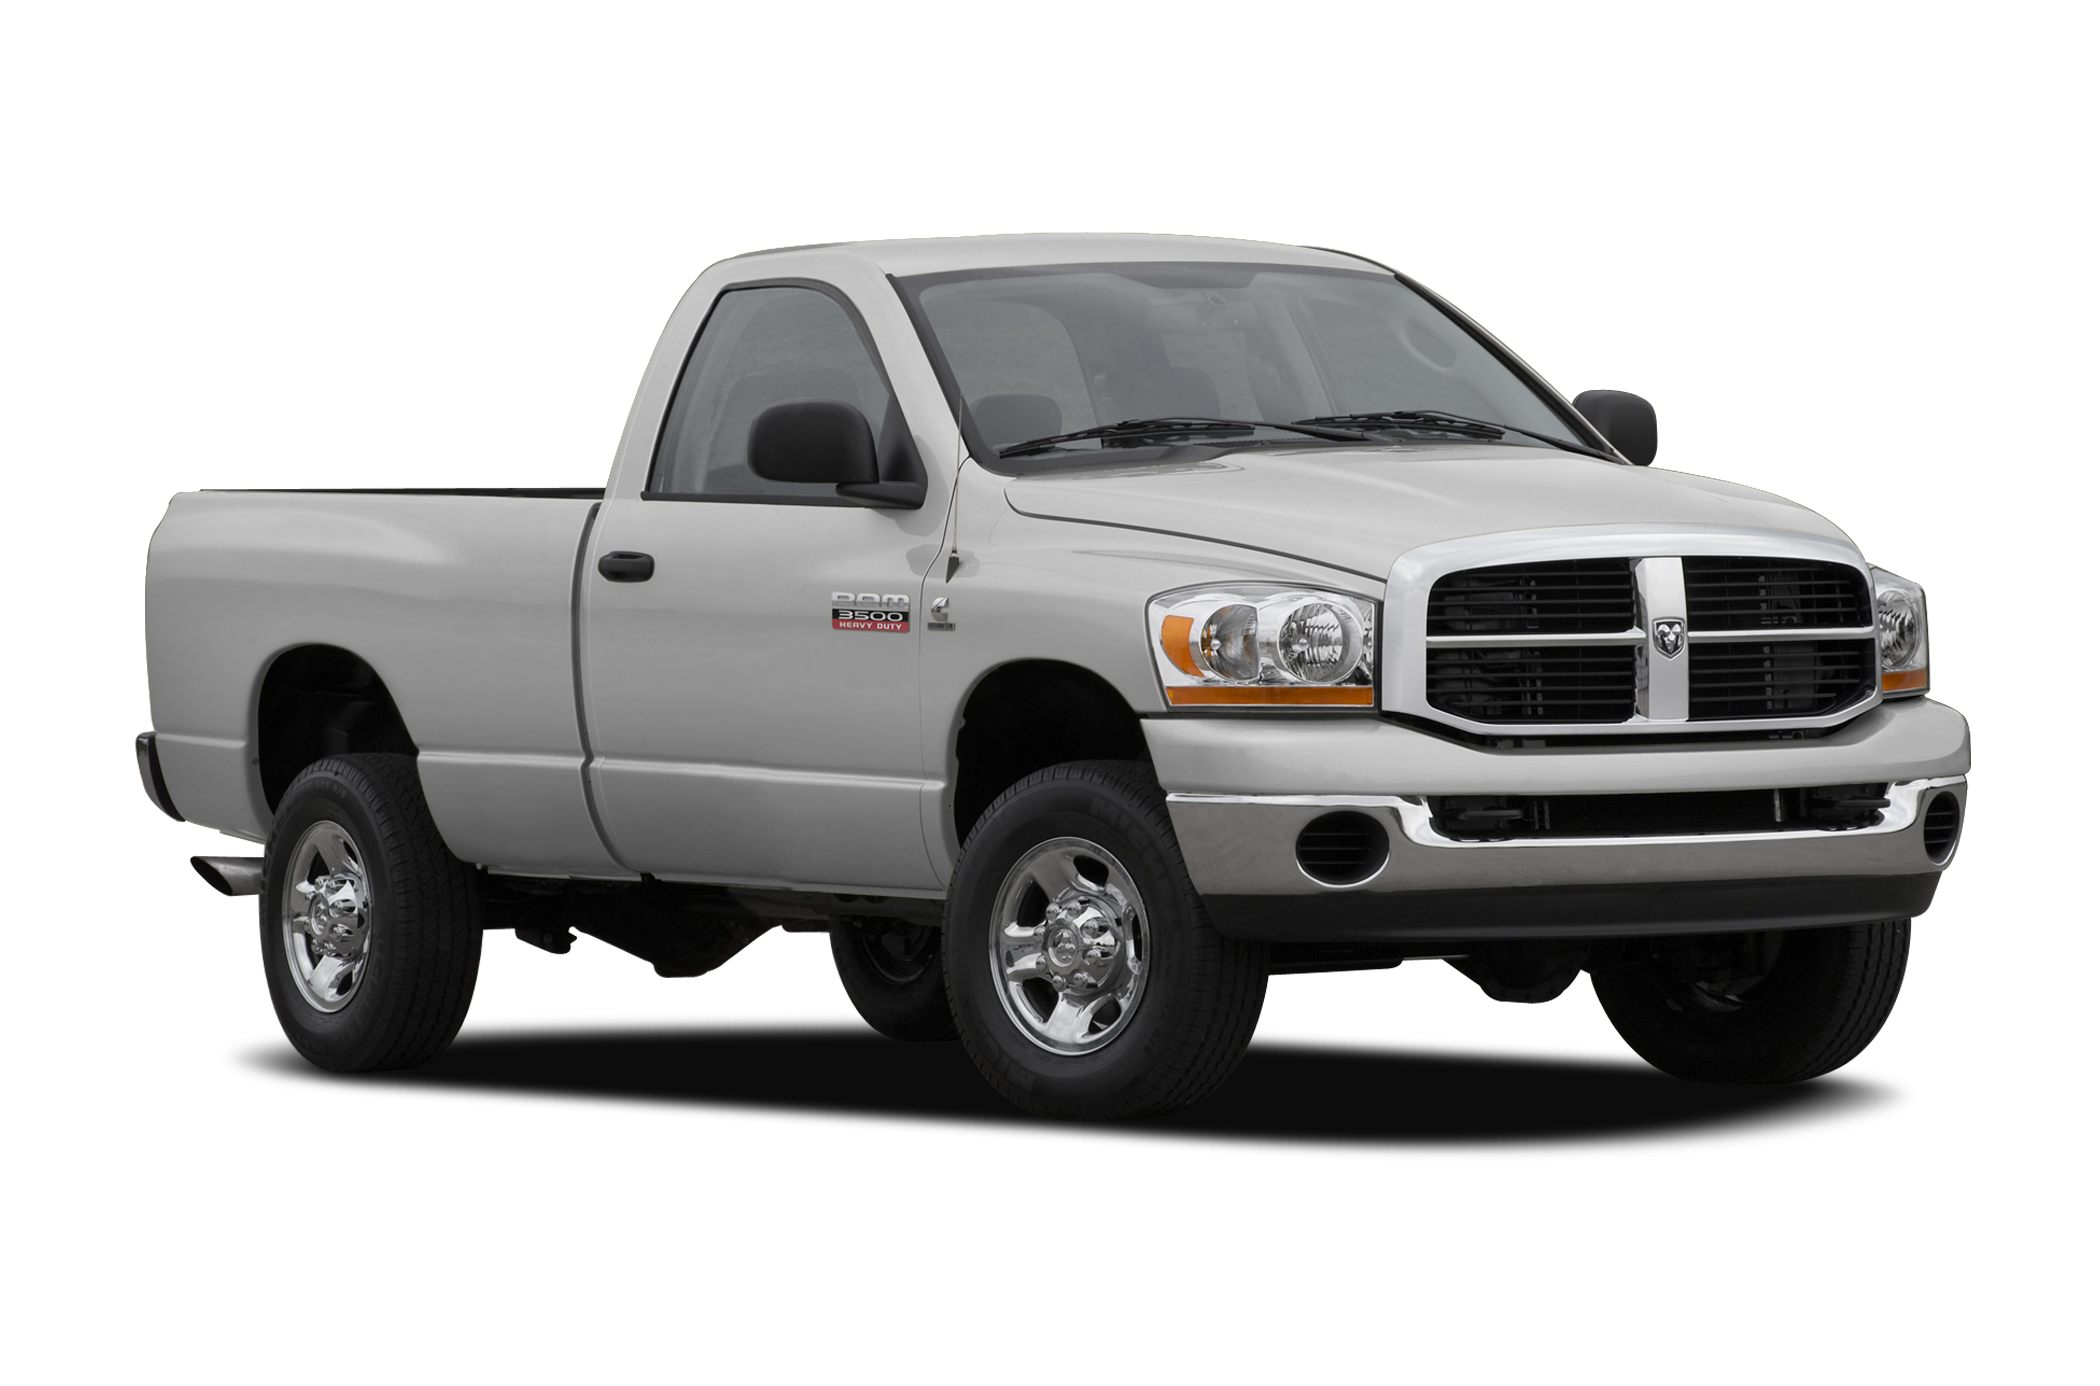 2007 Dodge Ram 2500 ST Miles 74461Color Gray Stock 17200 VIN 3D7KS26D47G742163